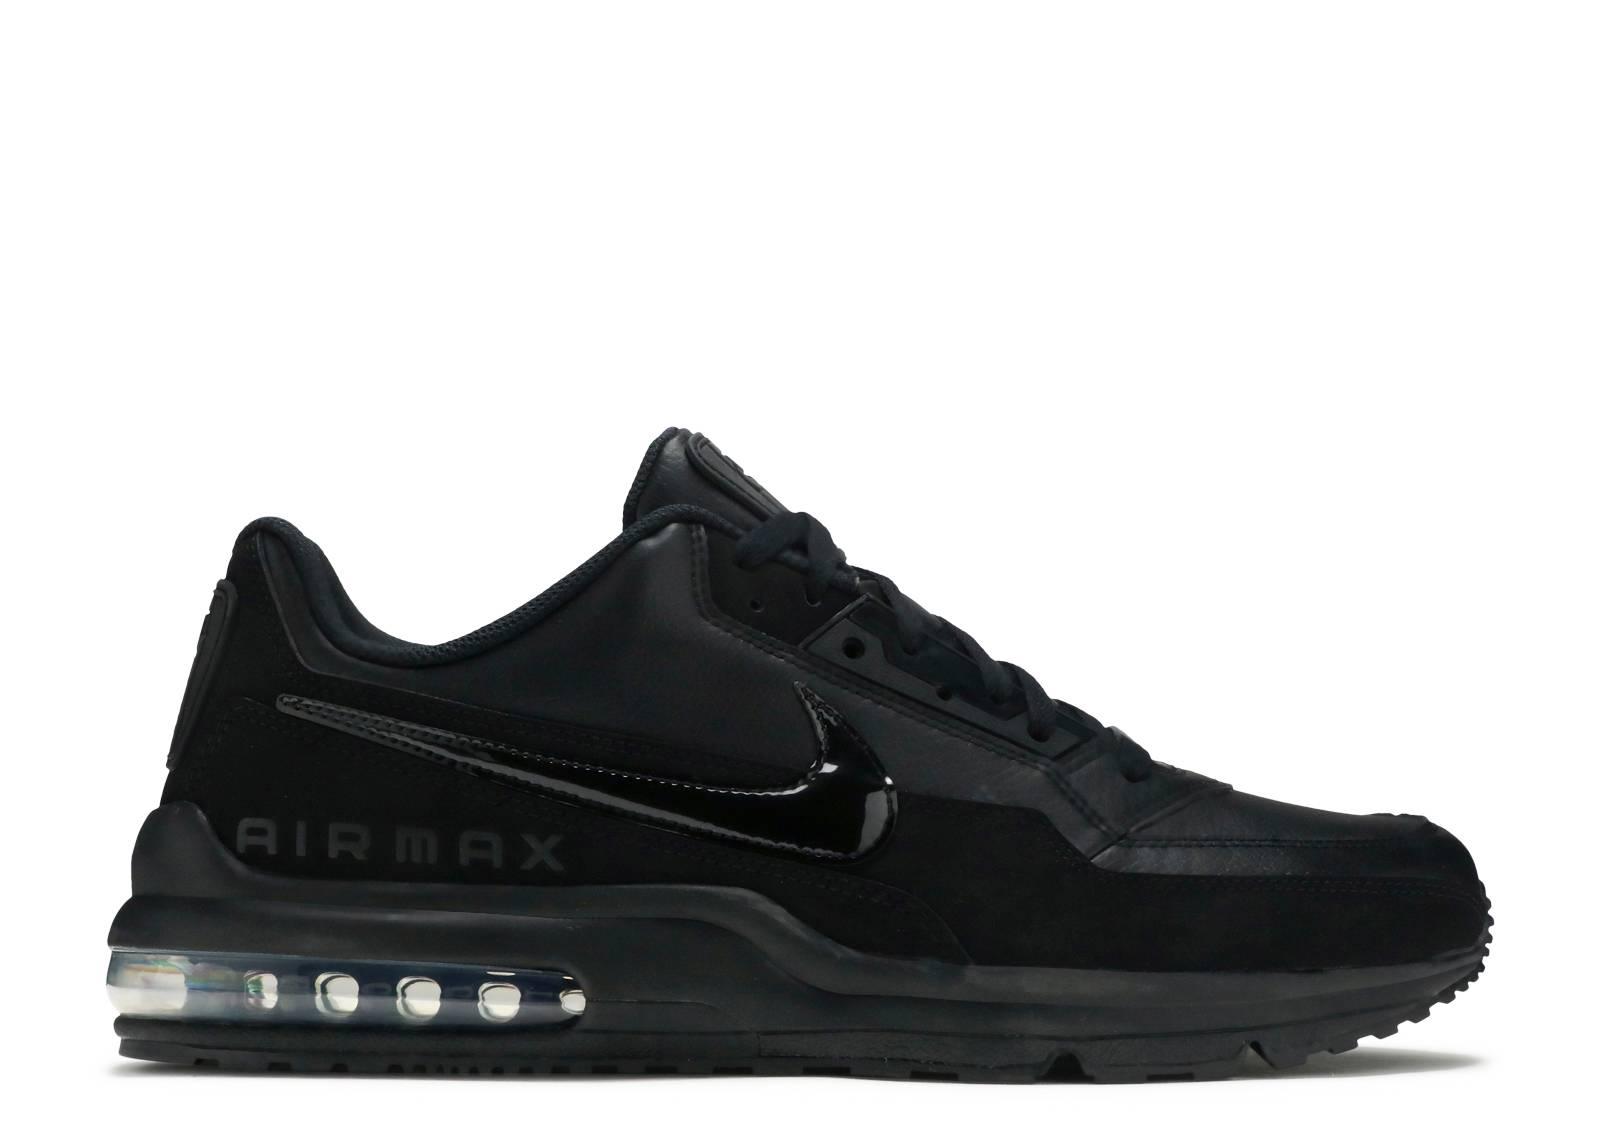 new style 94368 707e9 Air Max Ltd 3 - Nike - 687977 020 - black  black - black   Flight Club